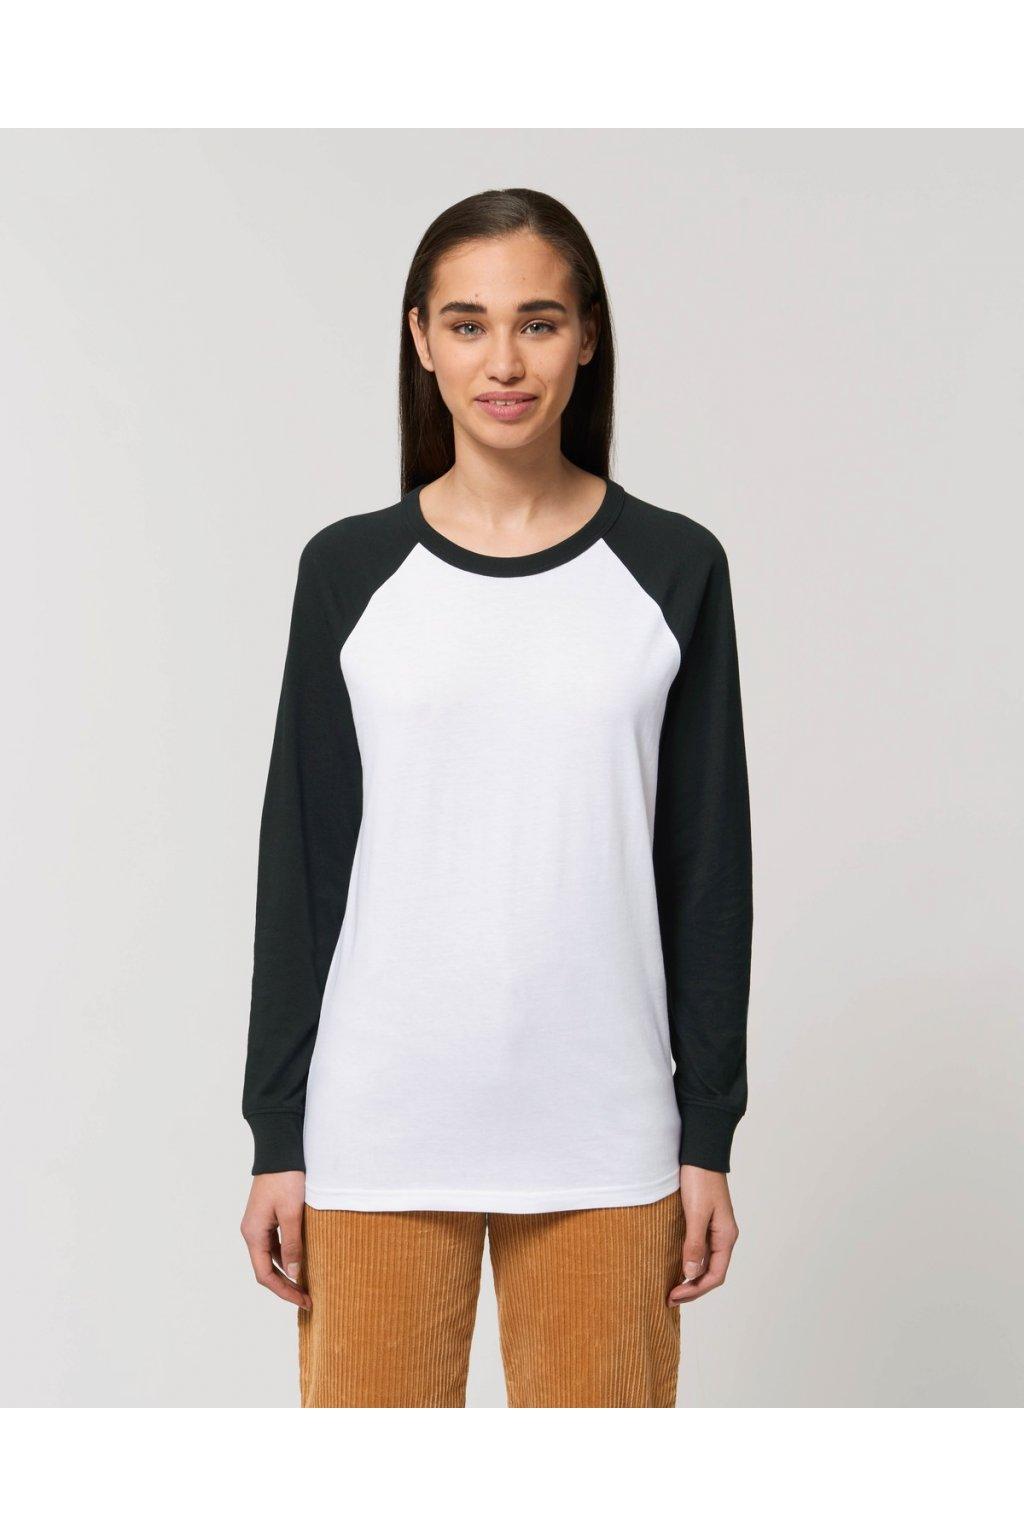 Catcher Long Sleeve White Black Studio Front Main 5